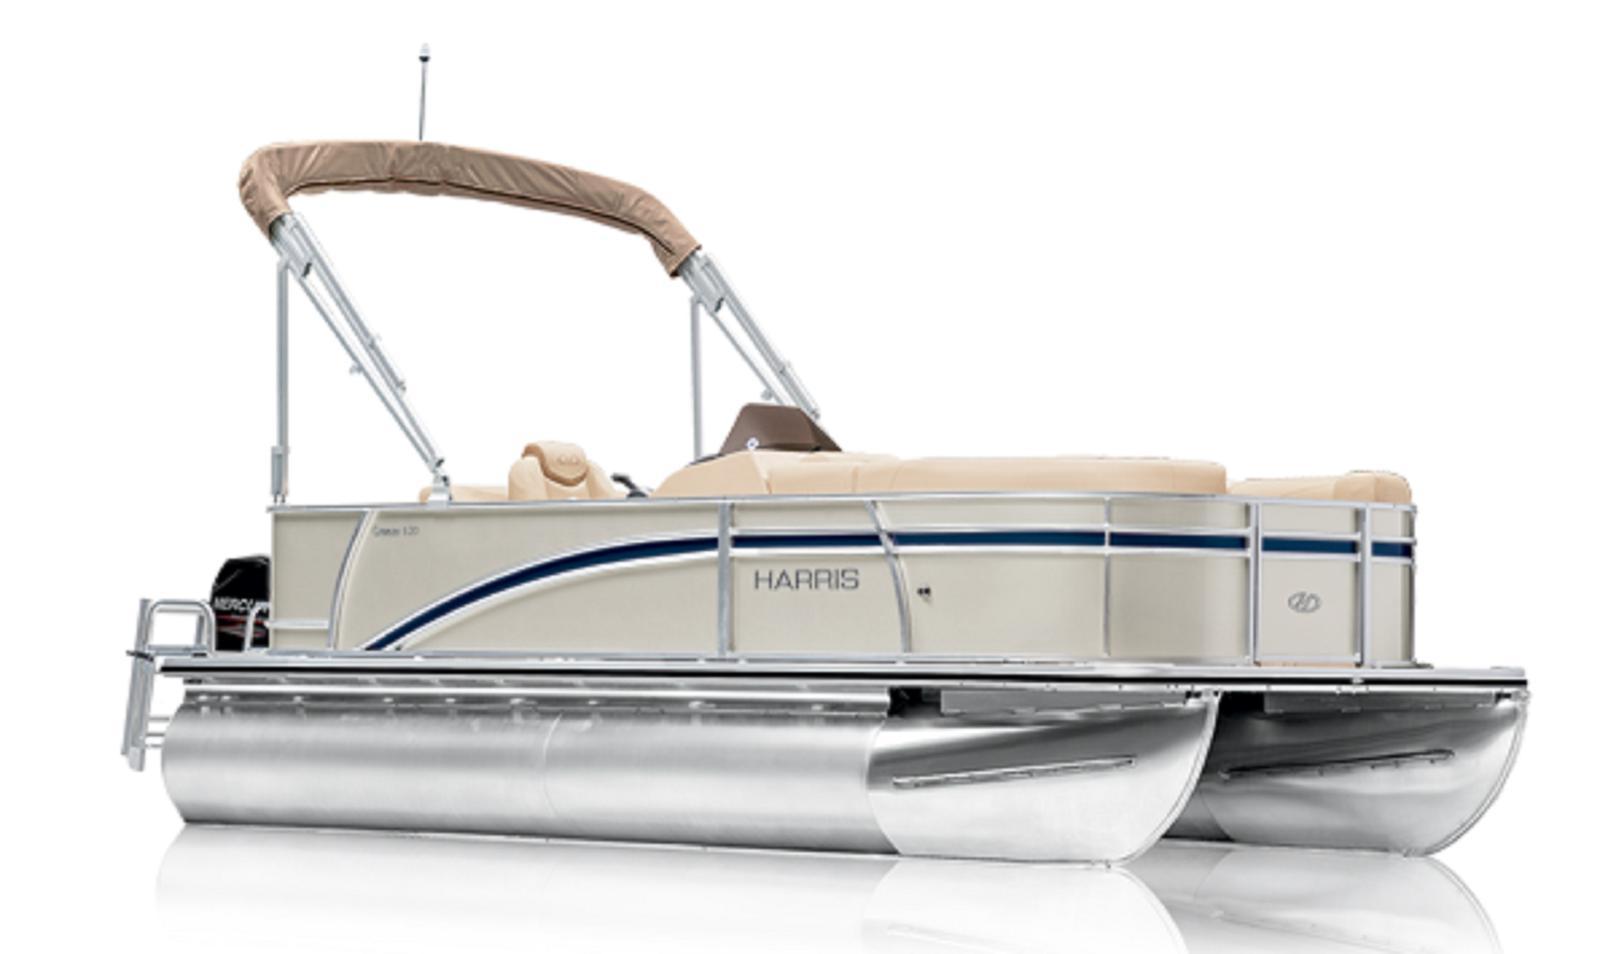 Harris Cruiser 220 SL